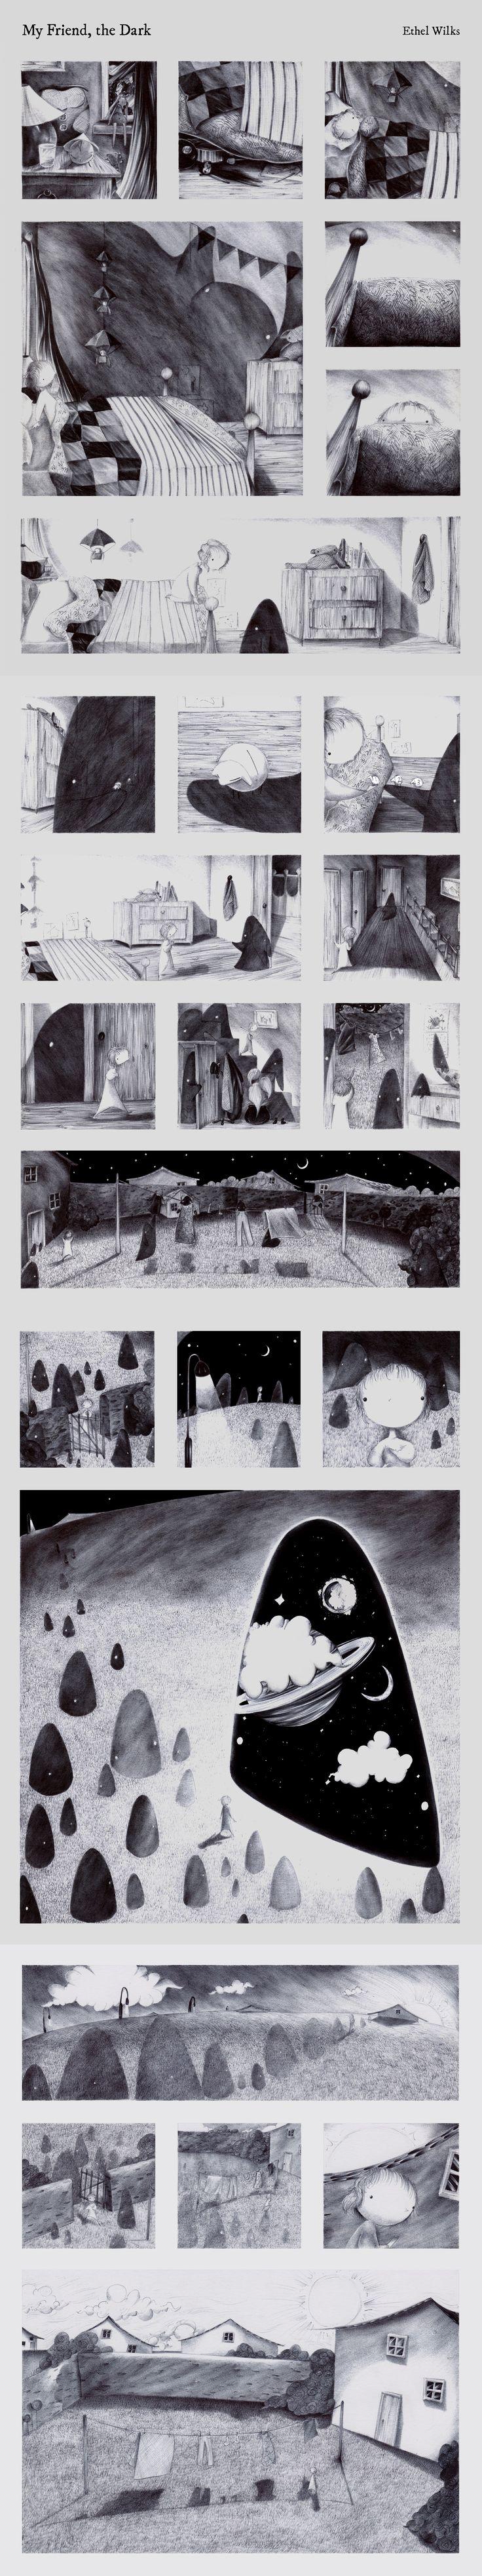 'My Friend, the Dark' by Ethel Wilks  www.facebook.com/ethelwilks   #art #illustration #graphicnovel #comic #indiecomic #indiegraphicnovel #silentgraphicnovel #biro #shortstory #ink #wordlesscomic